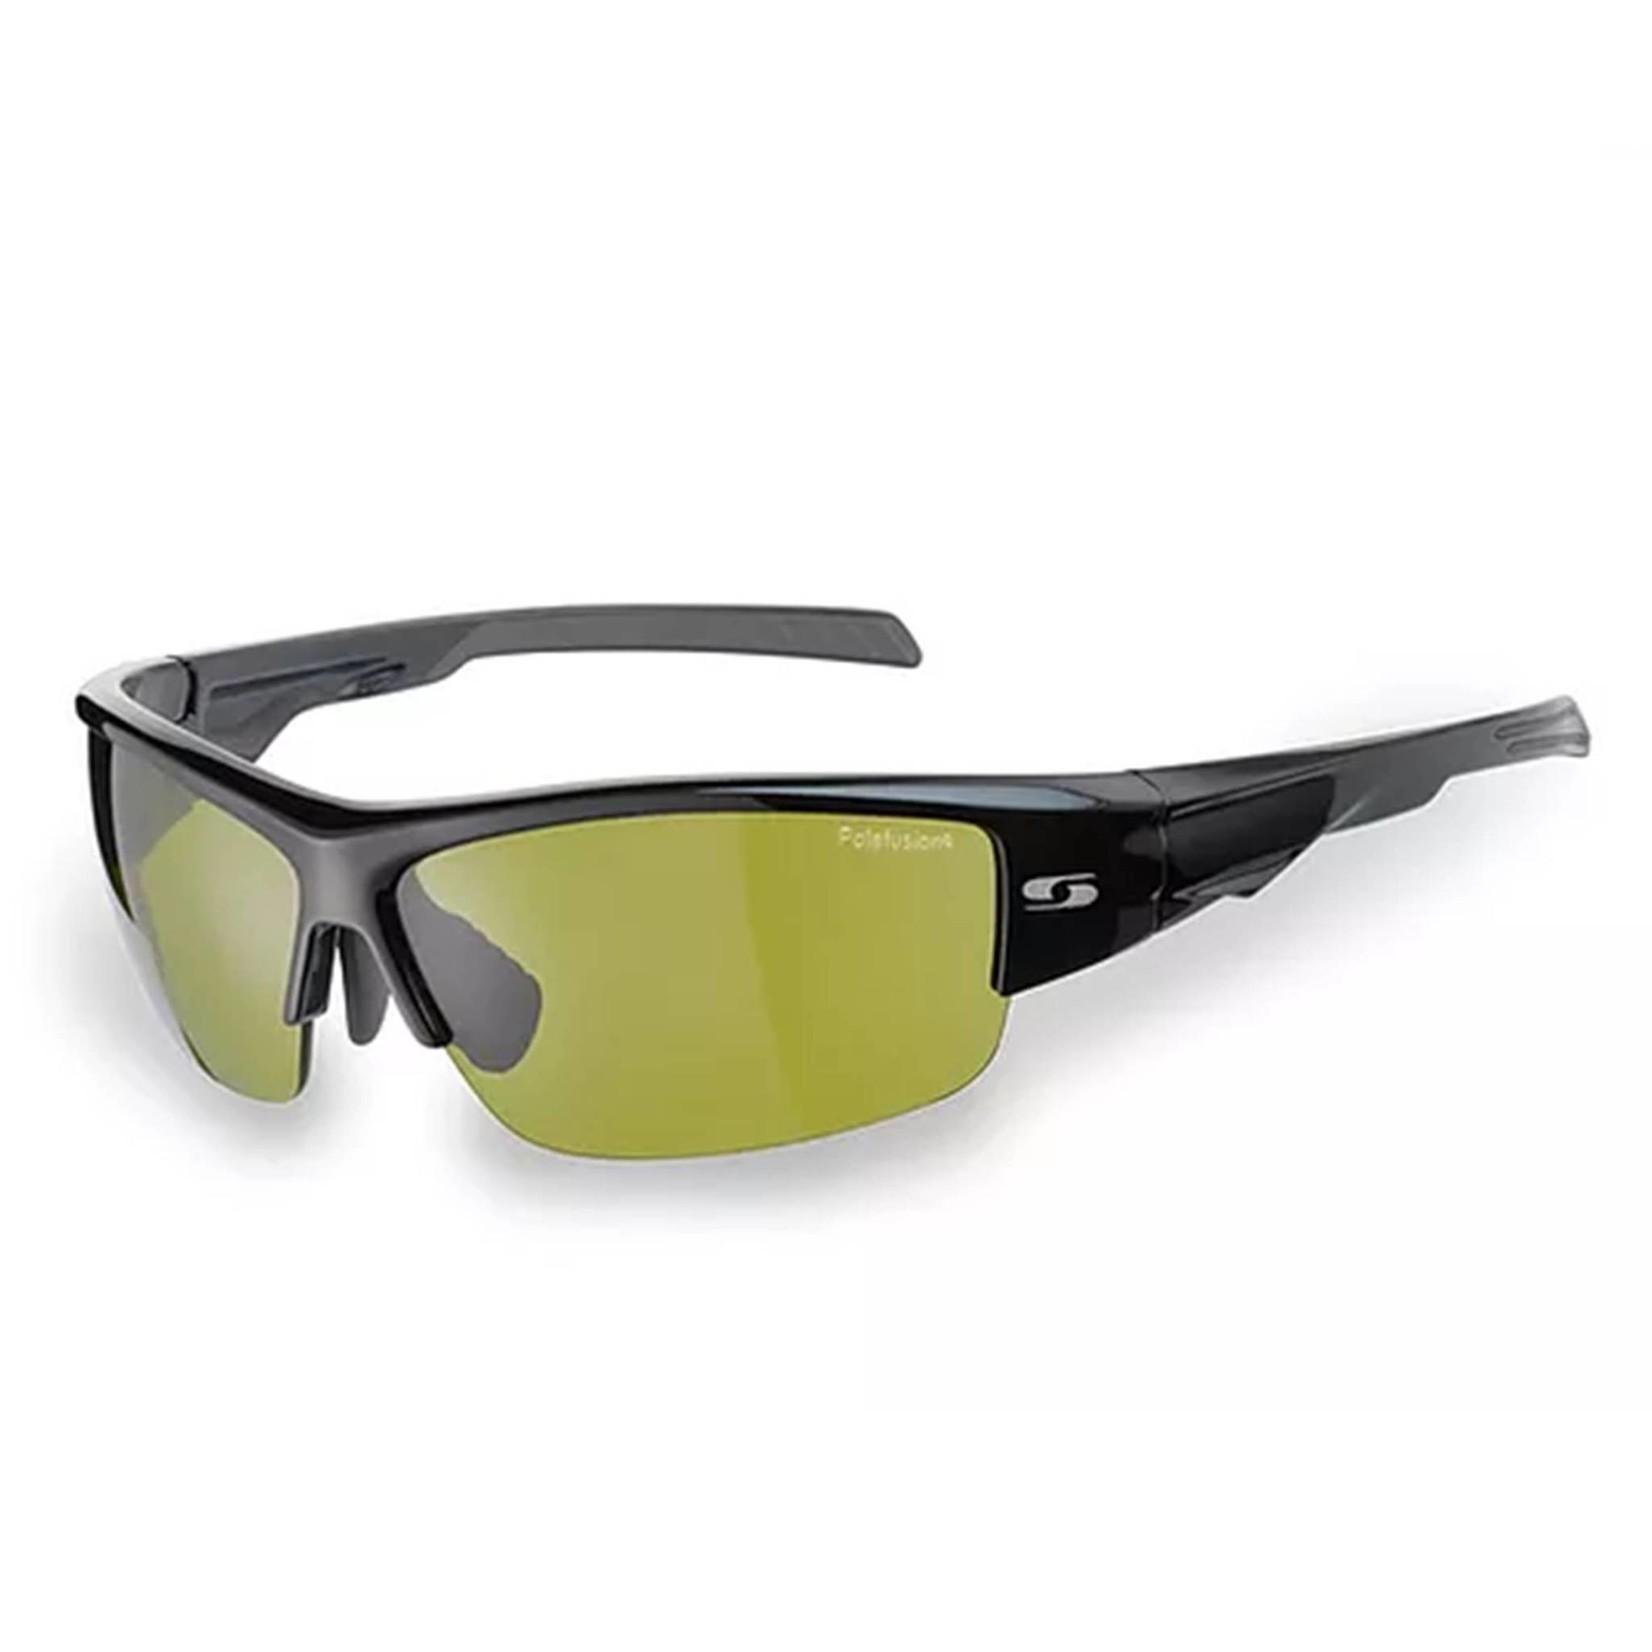 Sunwise Parade Sunglasses Black